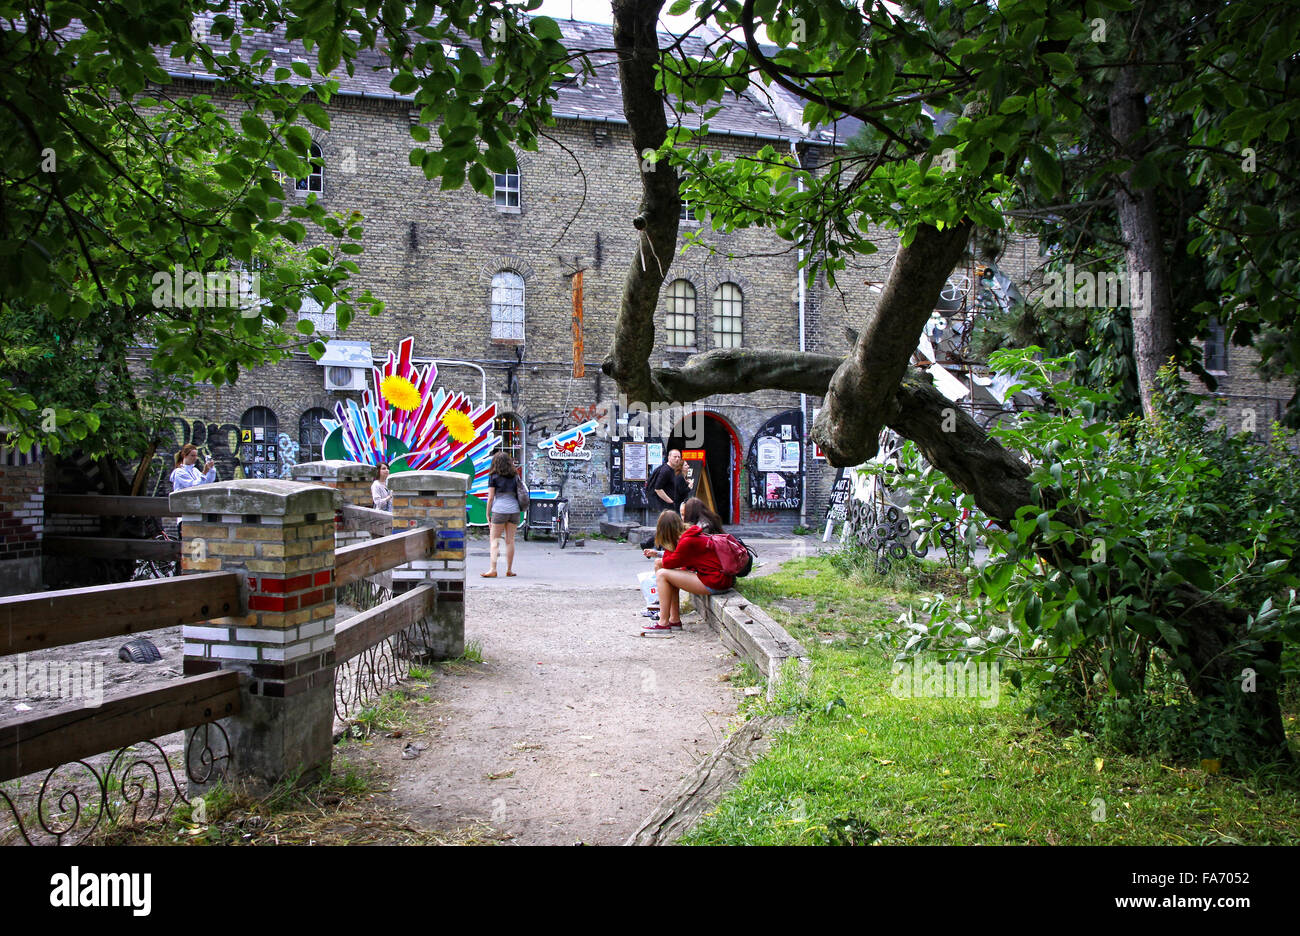 Fristaden Stock Photos & Fristaden Stock Images - Alamy